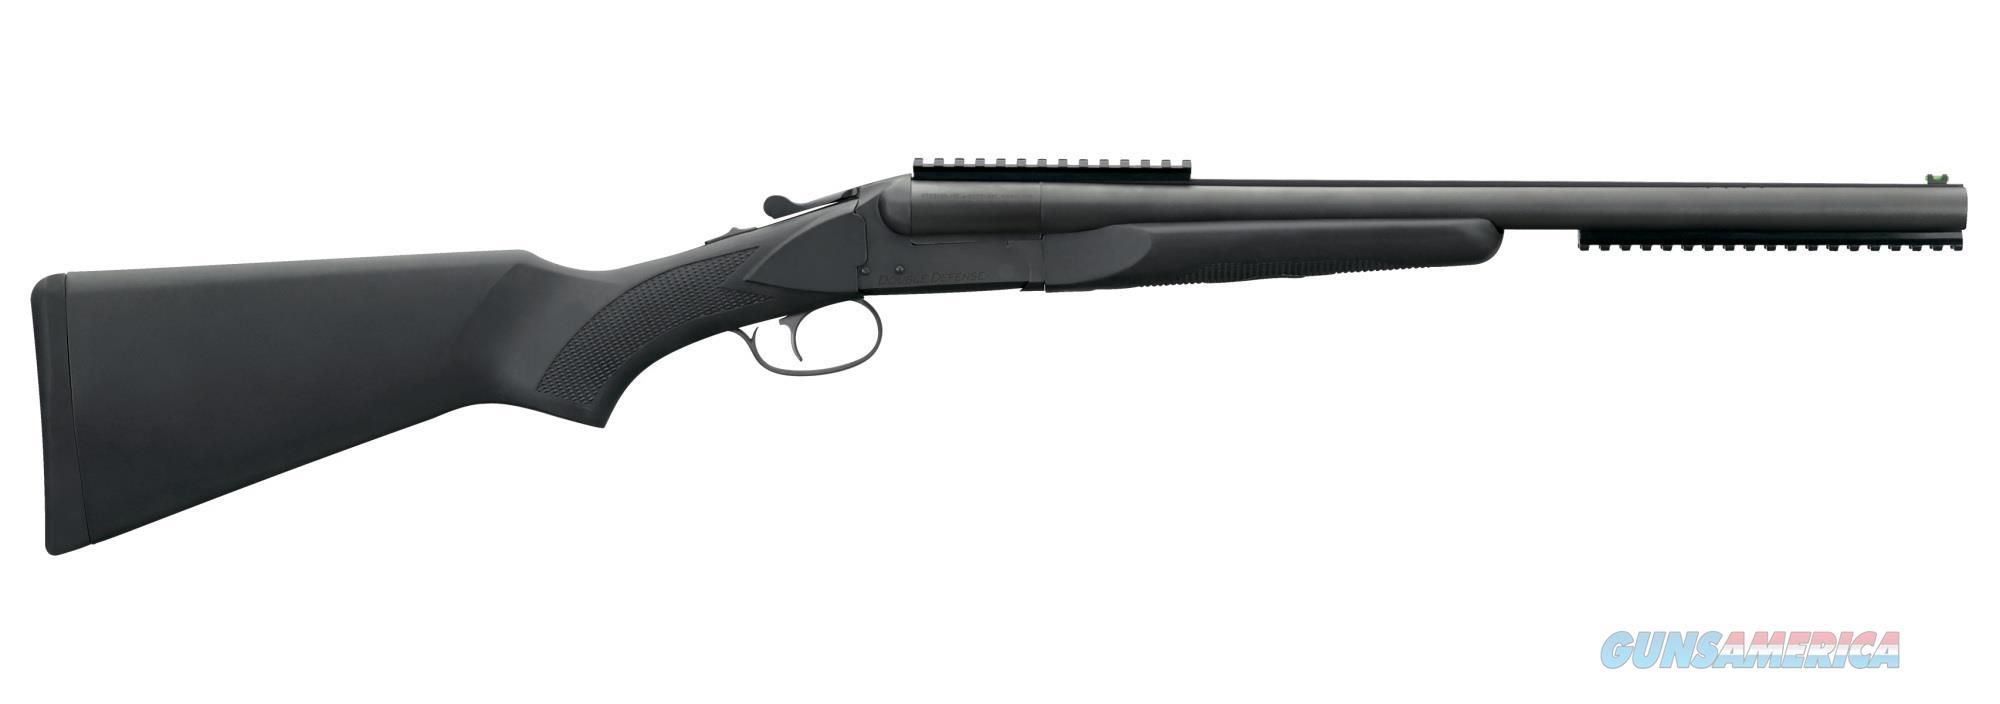 "Stoeger Double Defense 20 Gauge 20"" SxS 31447   Guns > Shotguns > Stoeger Shotguns"